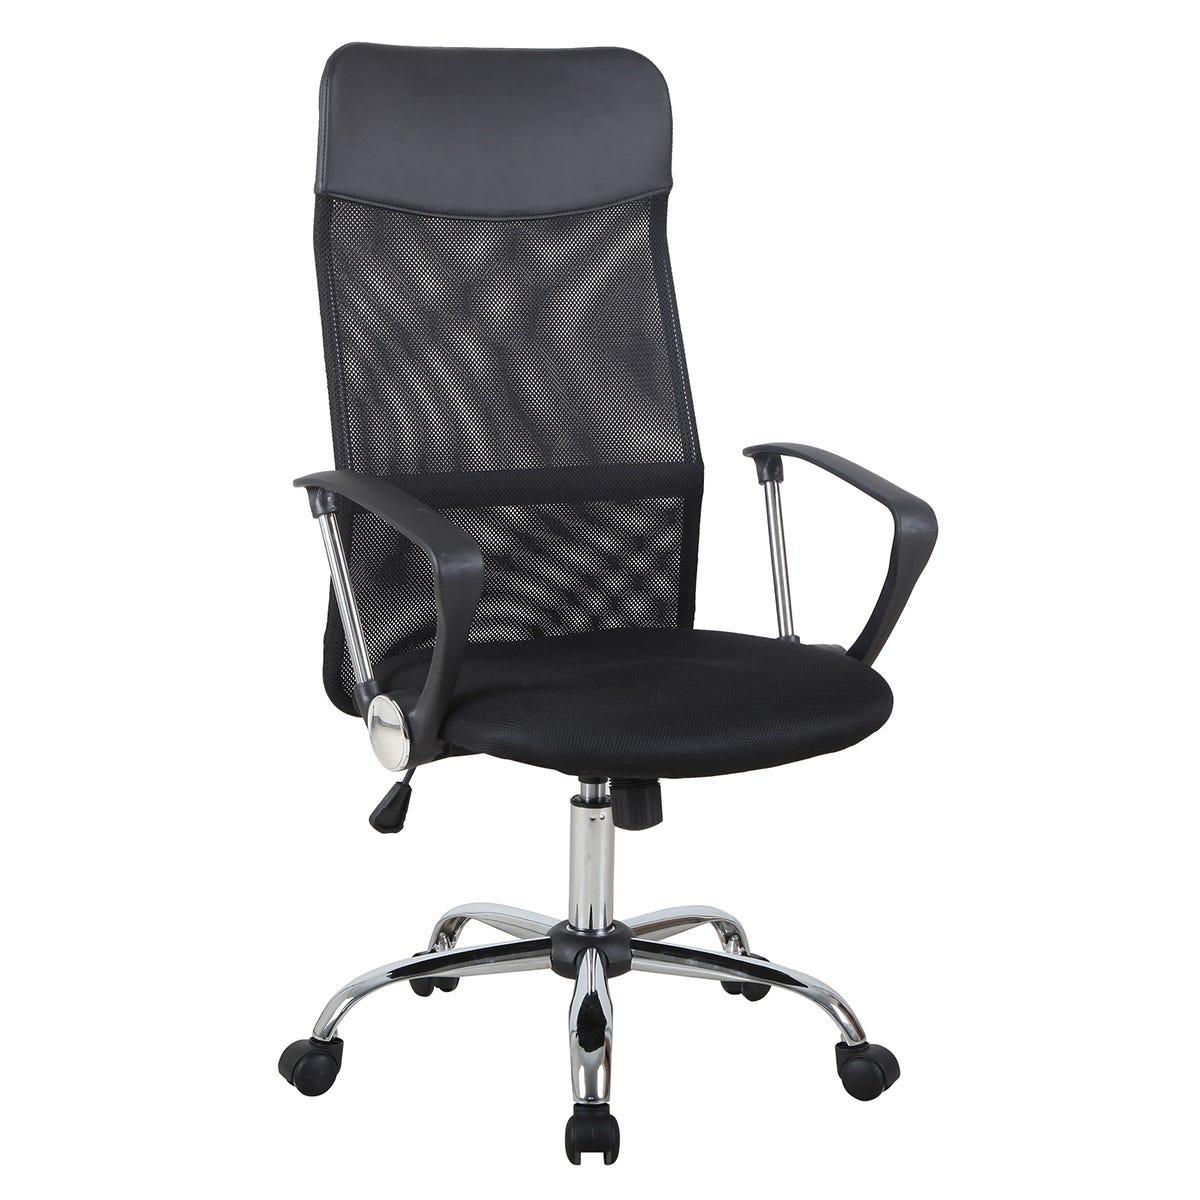 Zennor Osmo Mesh High Back Office Chair - Black